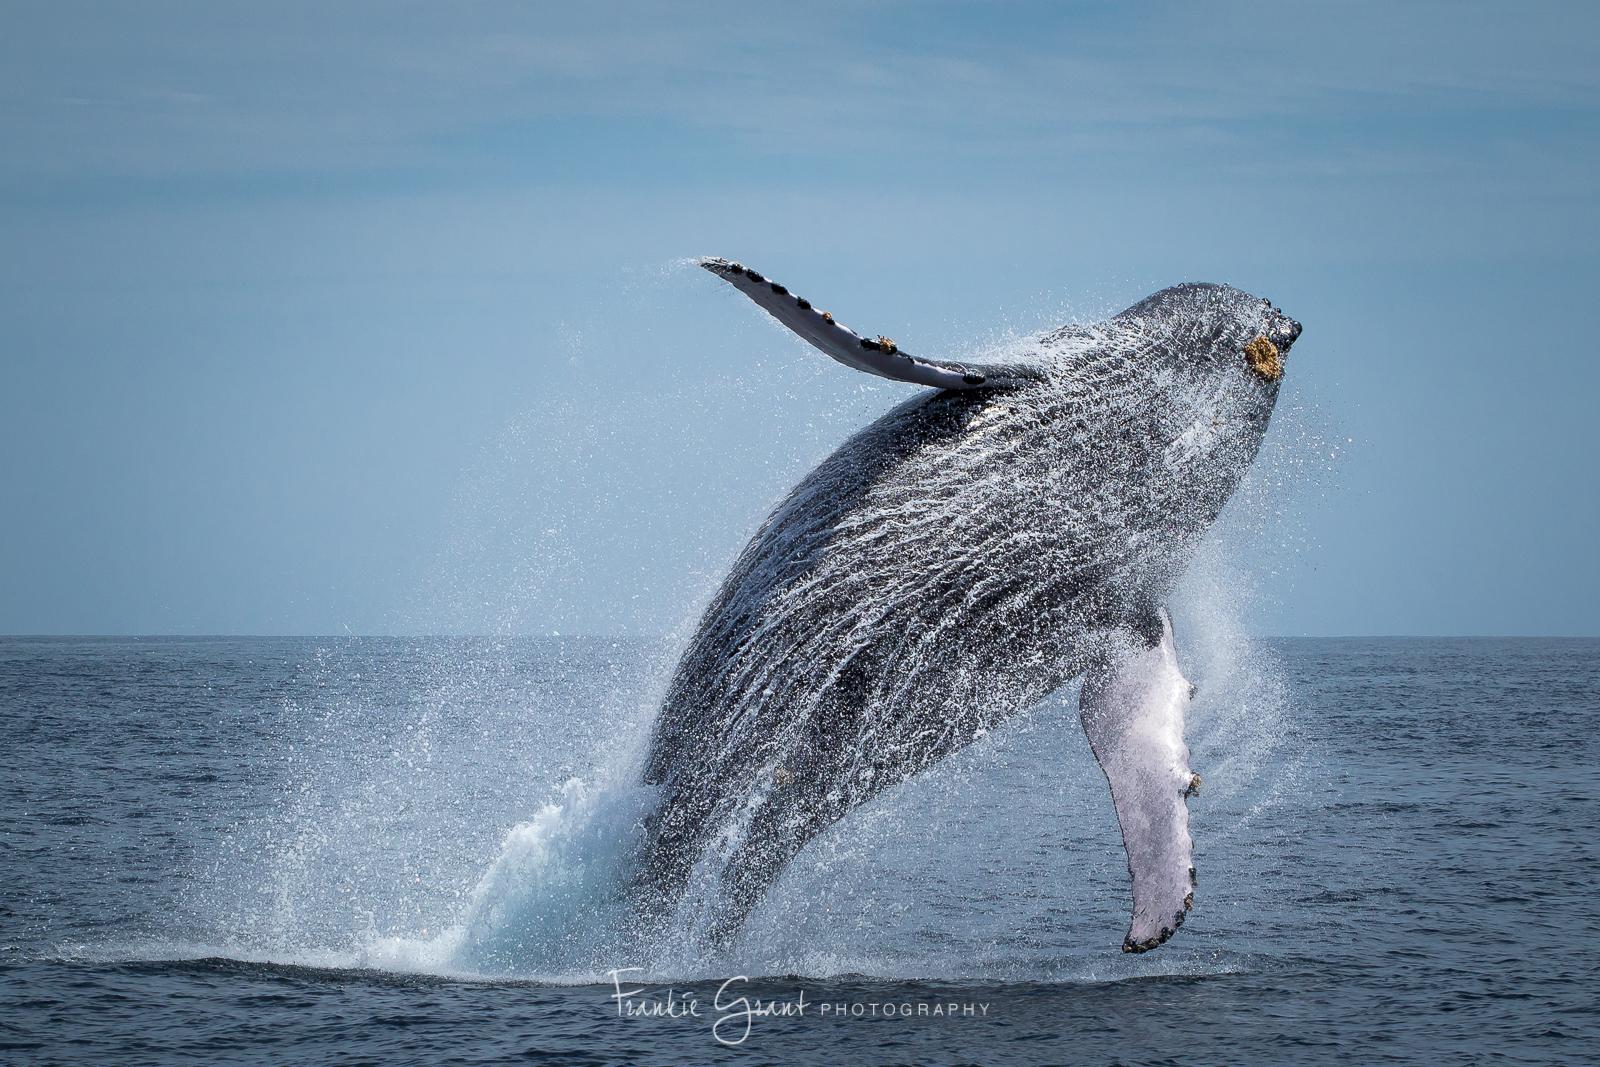 20160325-Whales-268.jpg